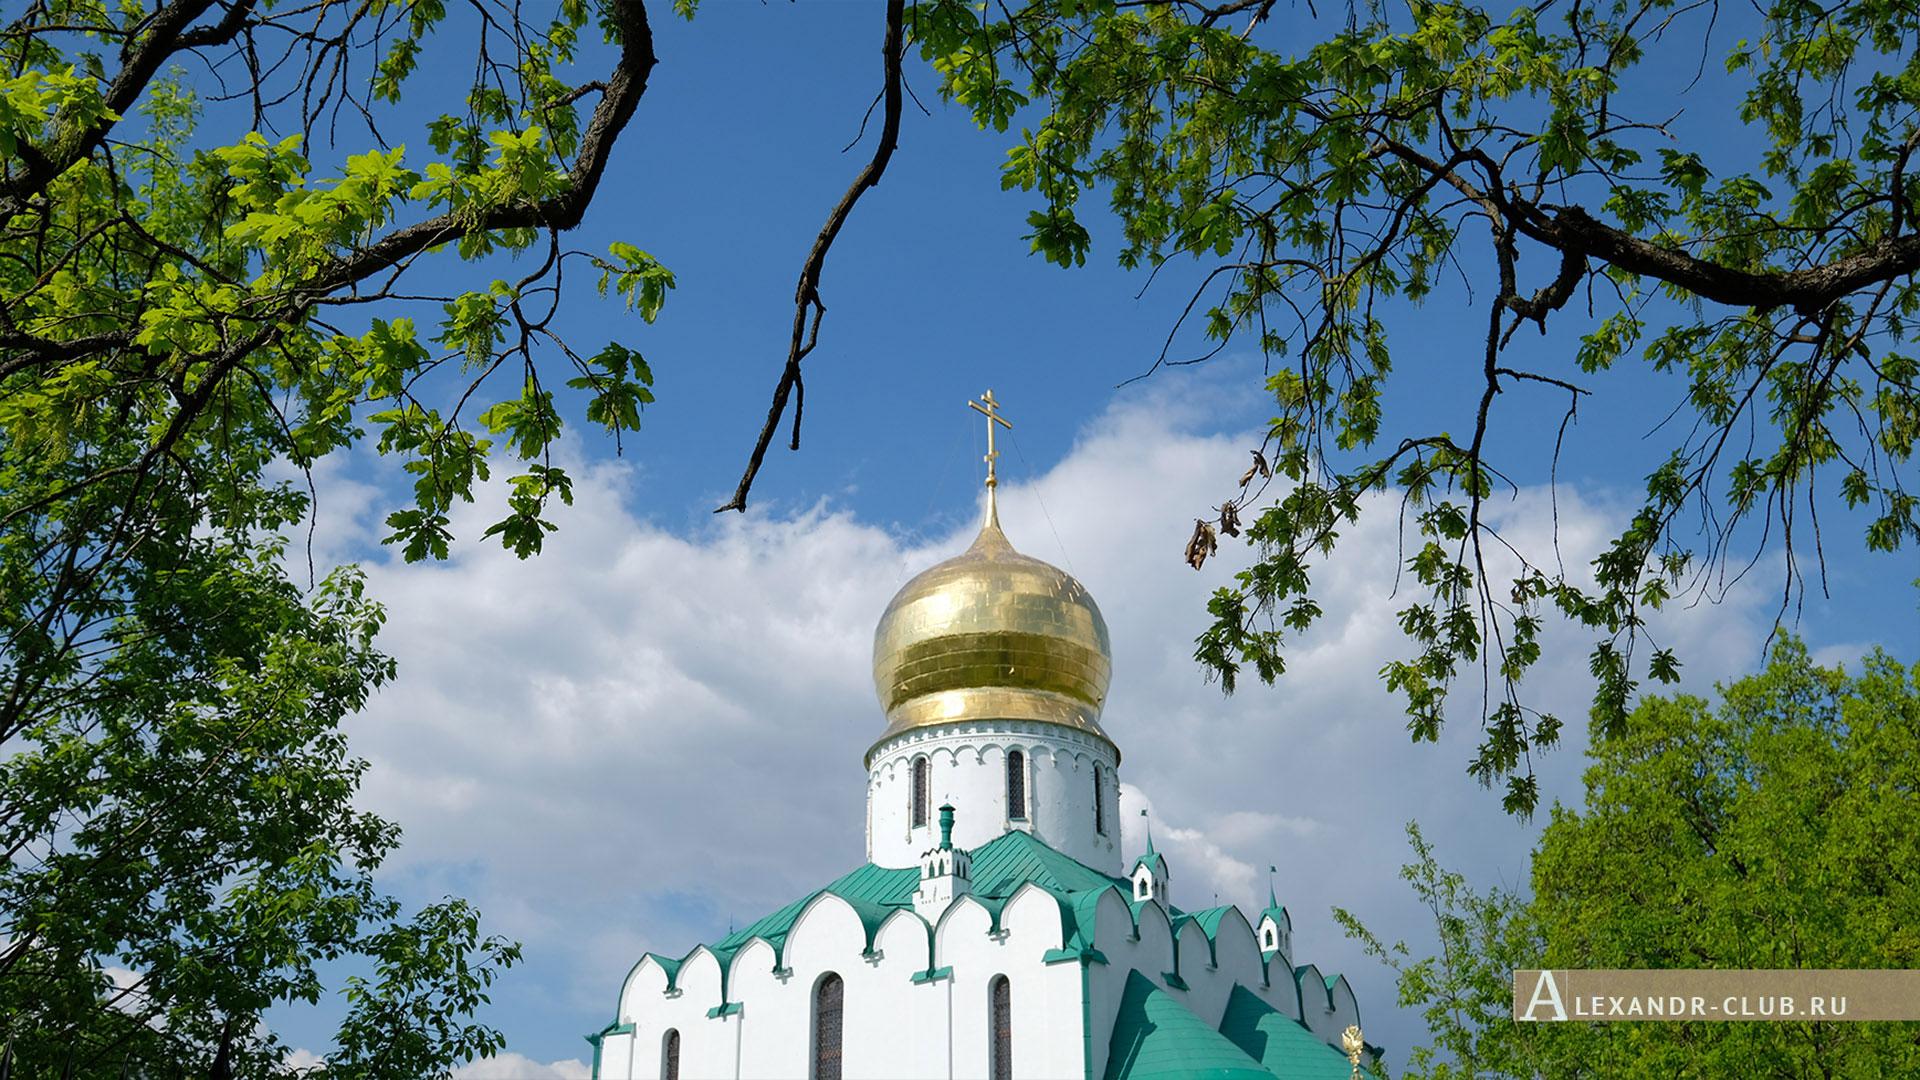 Царское Село, Александровский парк, весна, Феодоровский собор